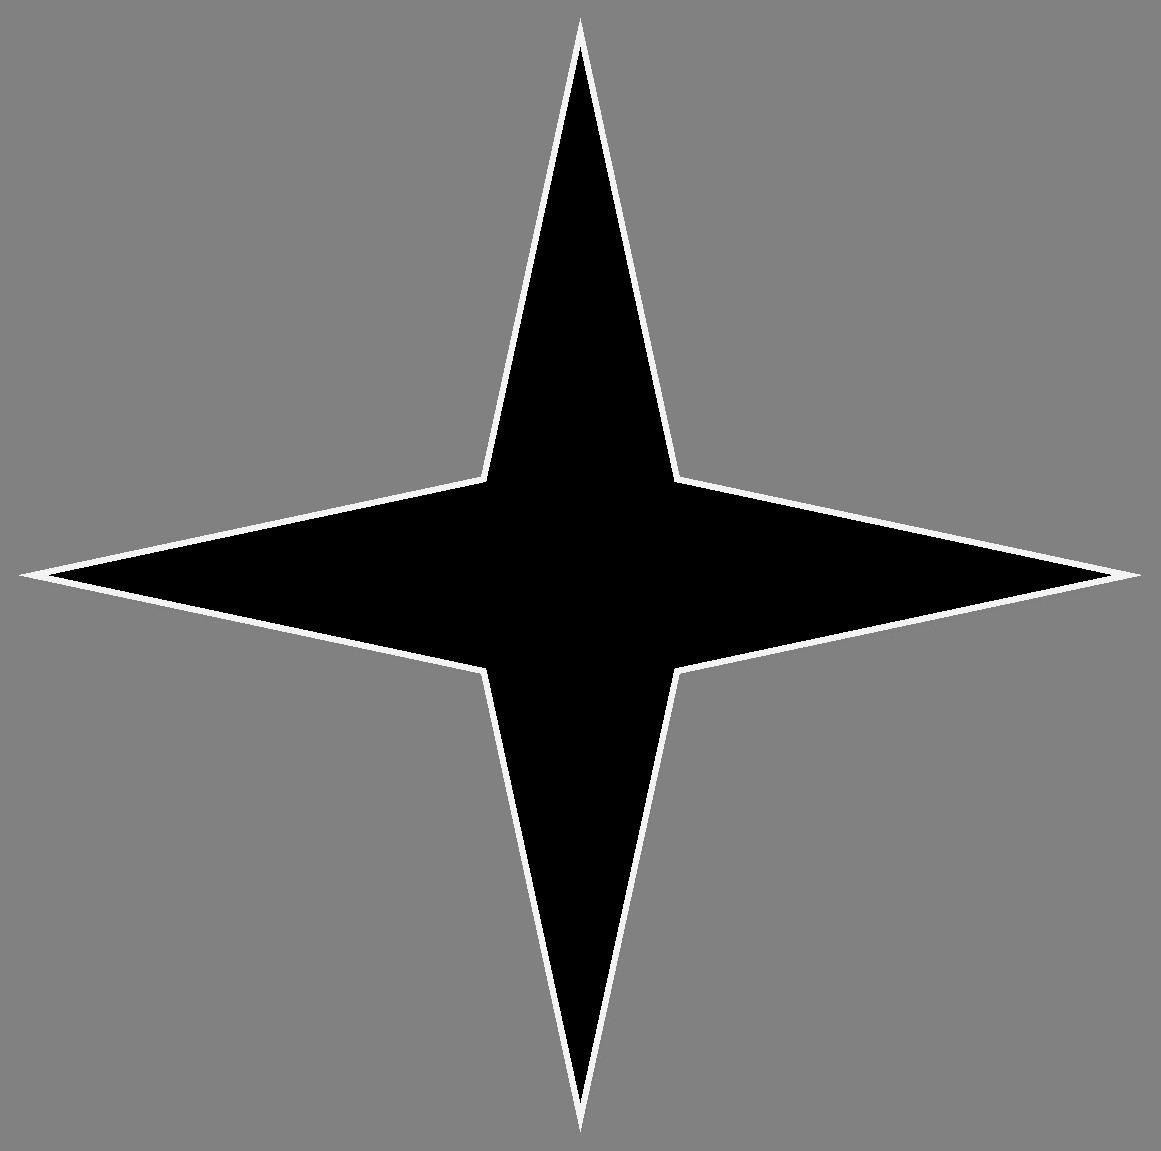 Blackstar.png - ClipArt Best